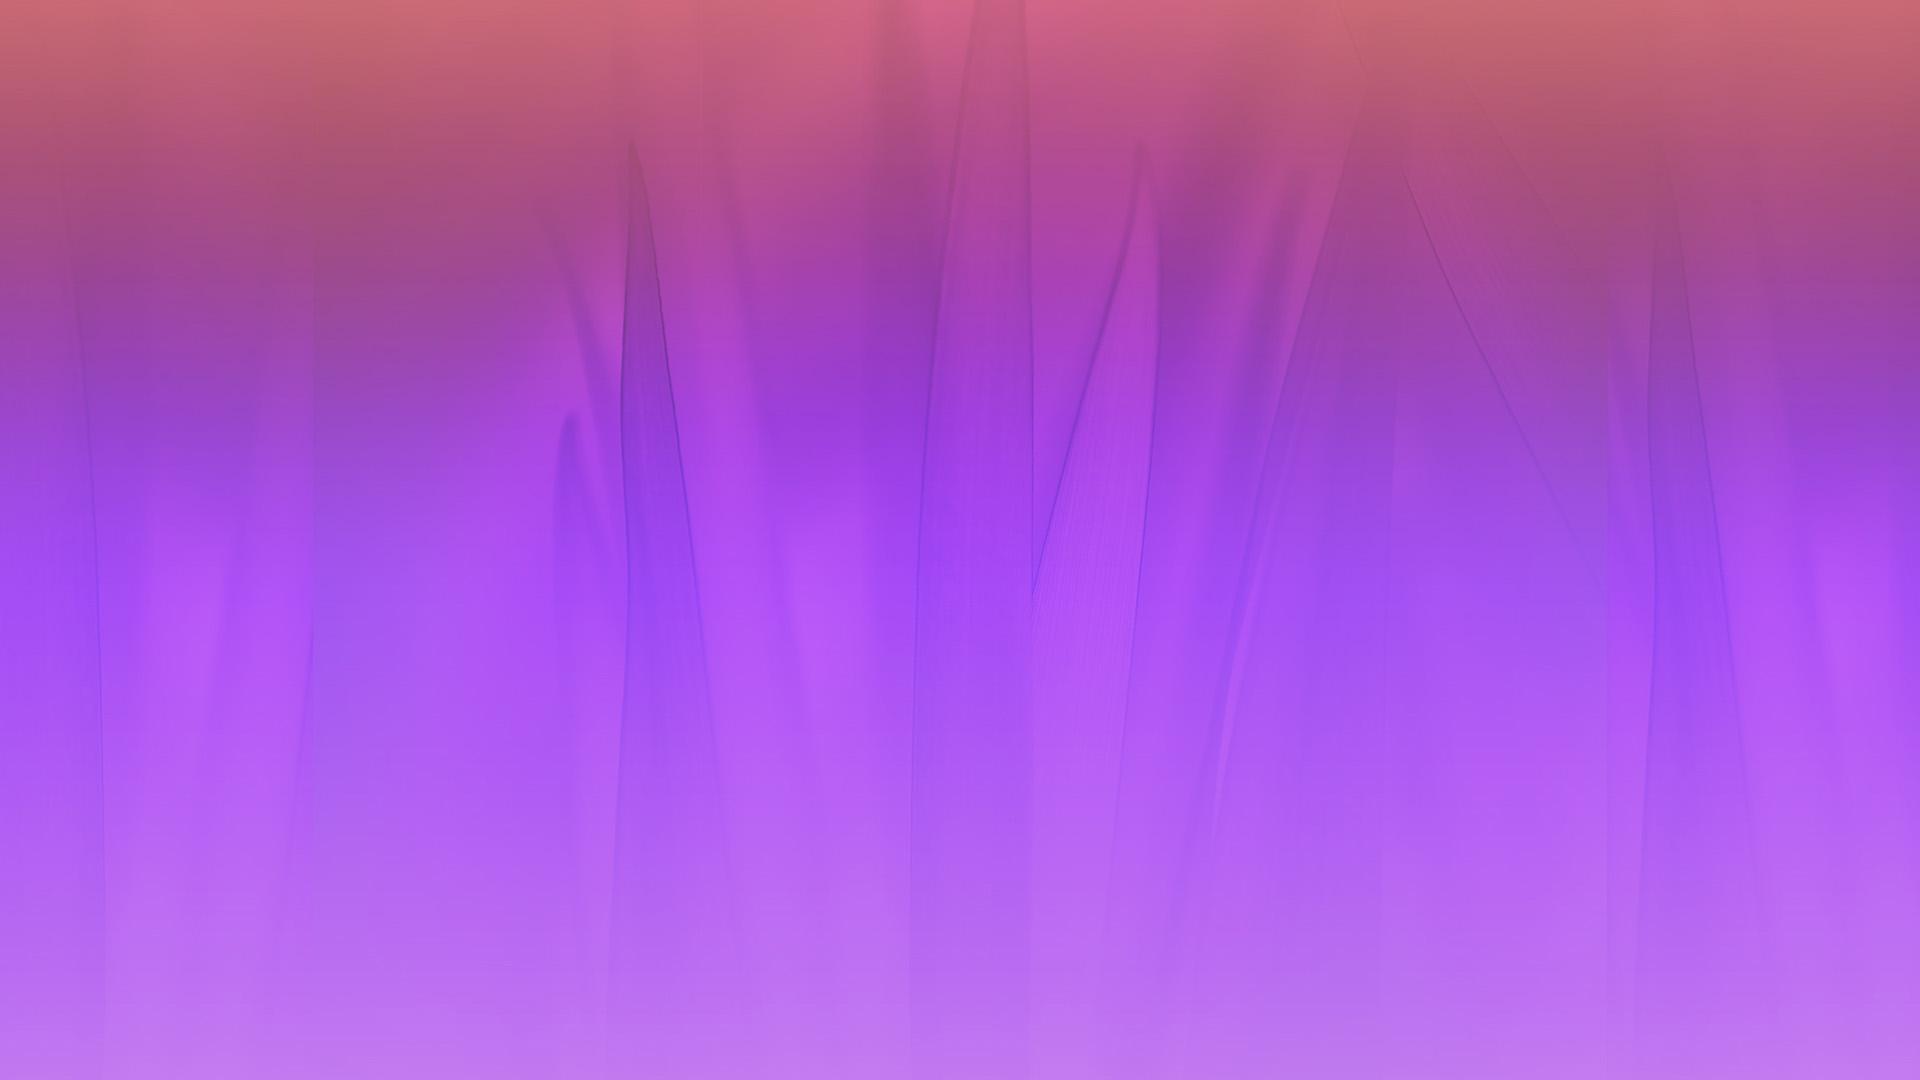 Rainbow Wallpaper For Iphone X Wallpaper For Desktop Laptop Vj76 Soft Blue Nature